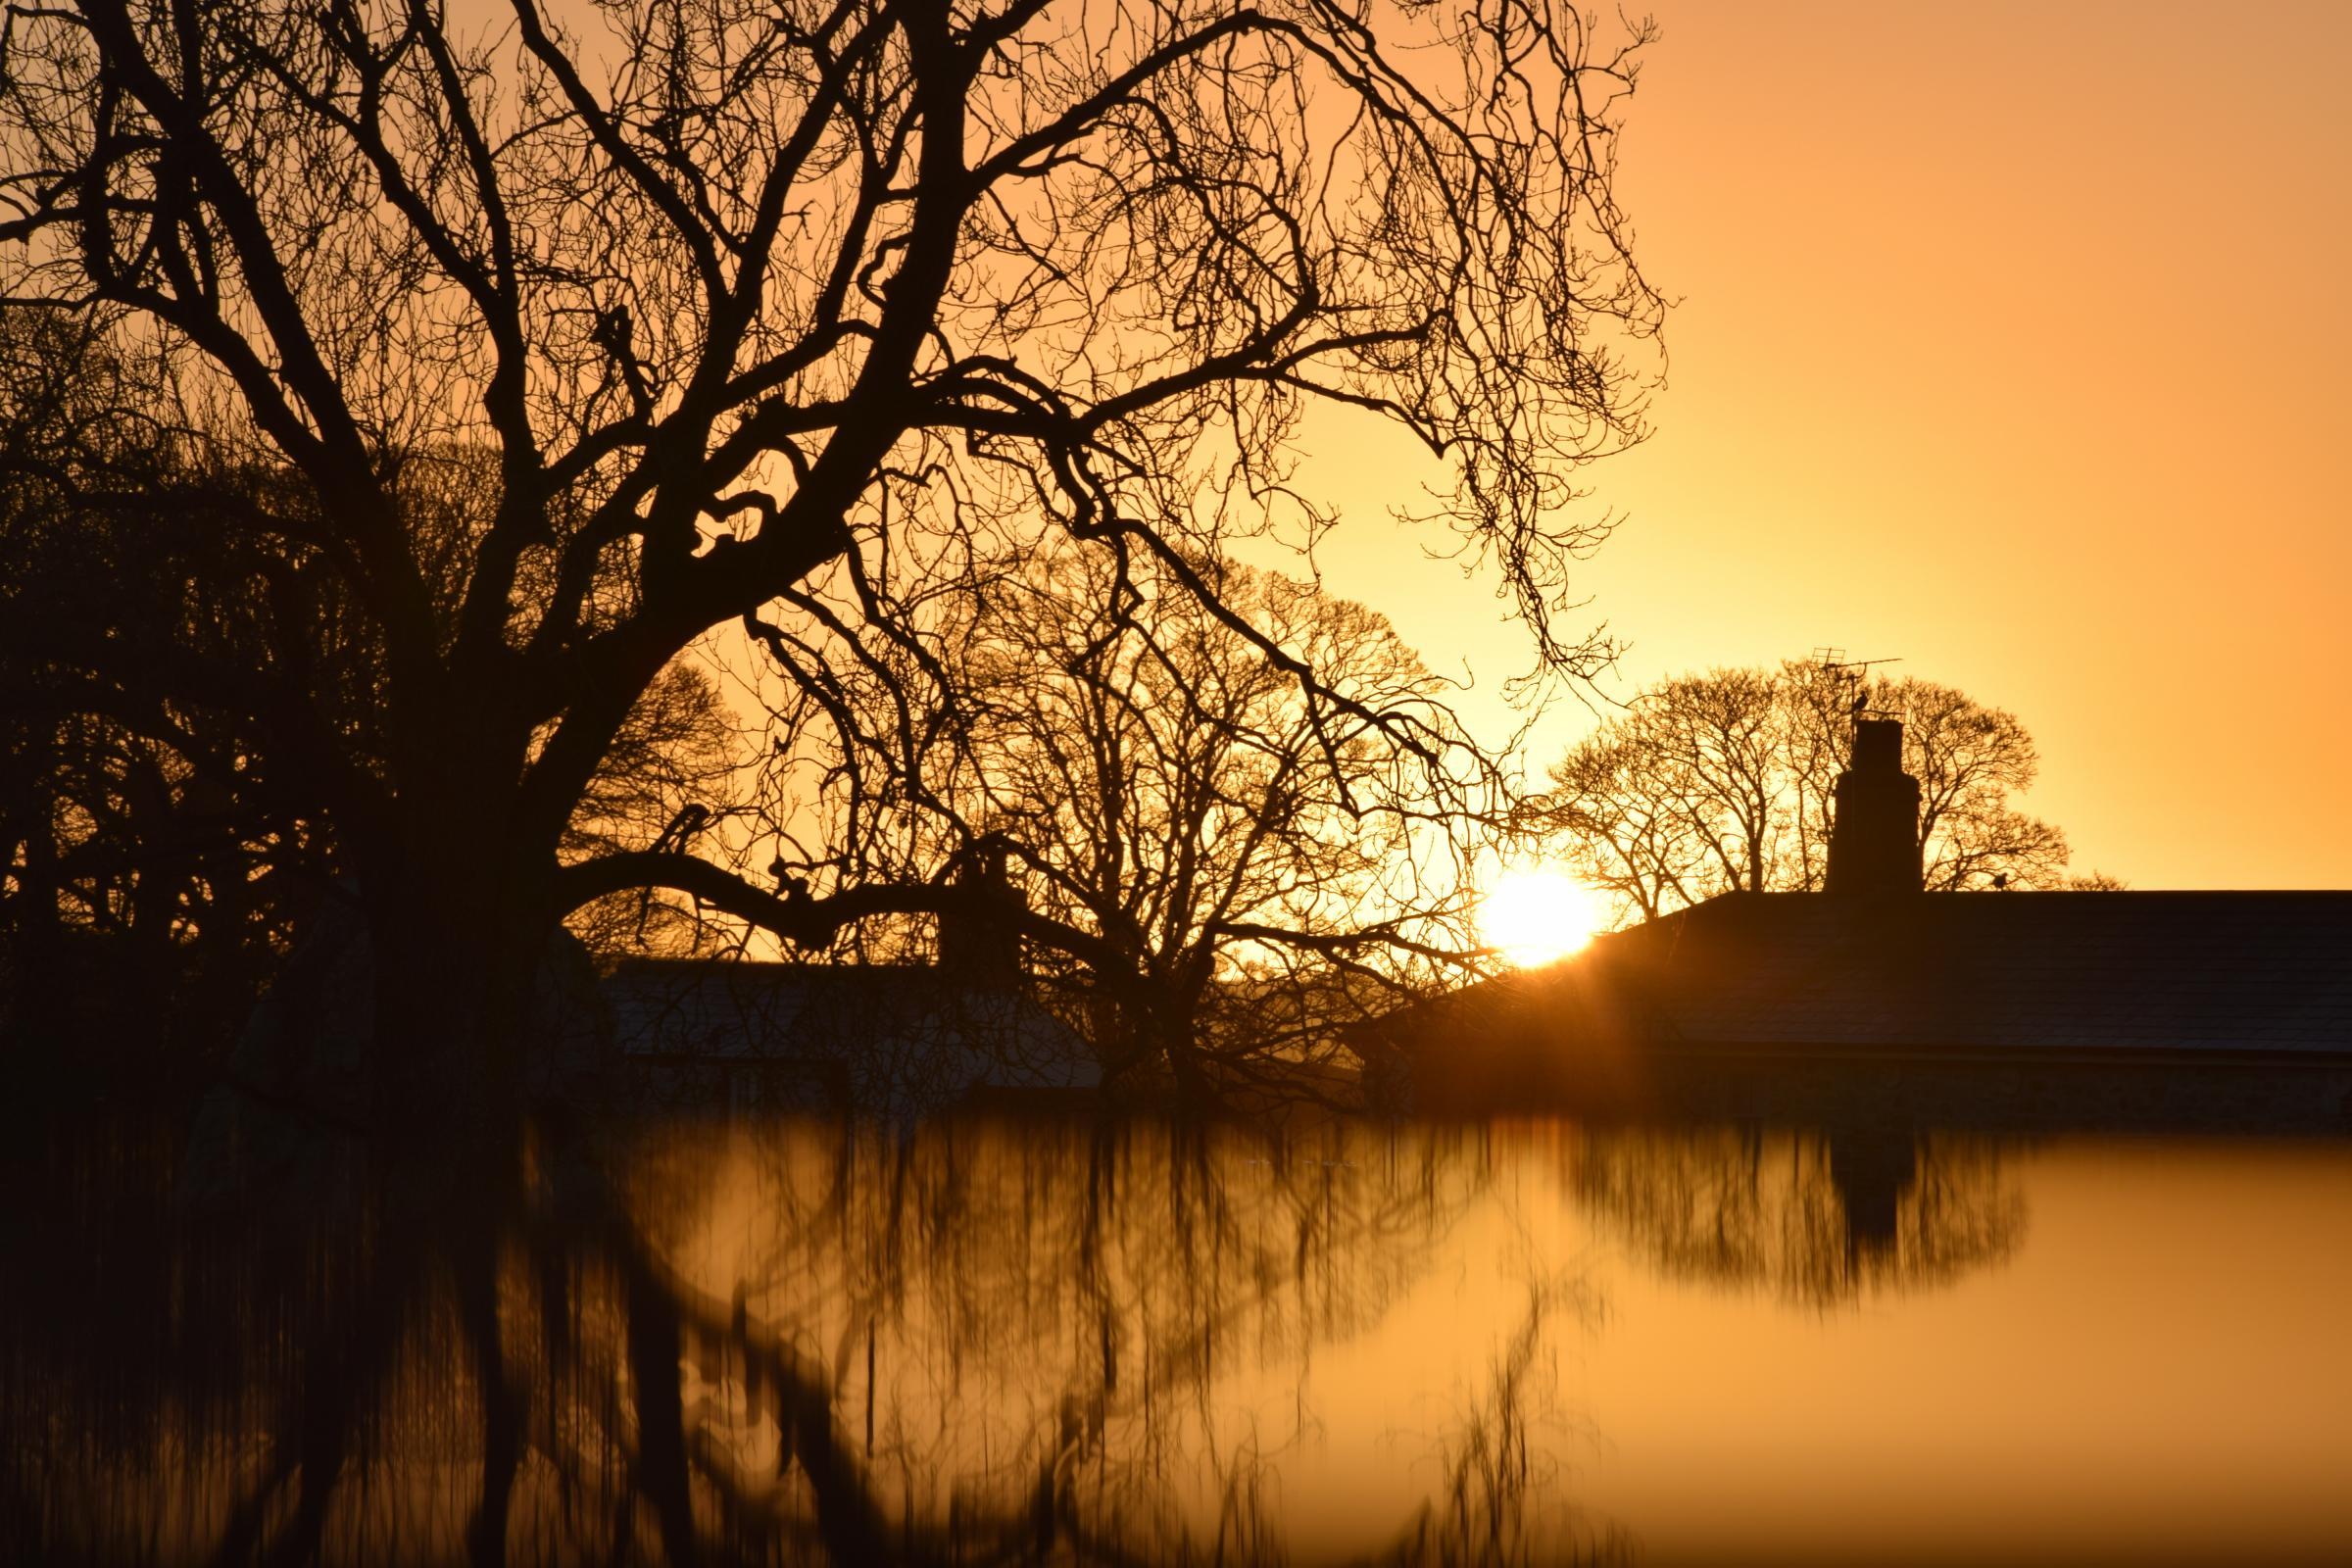 Avebury at sunrise wins Swindon College School of Art photography competition